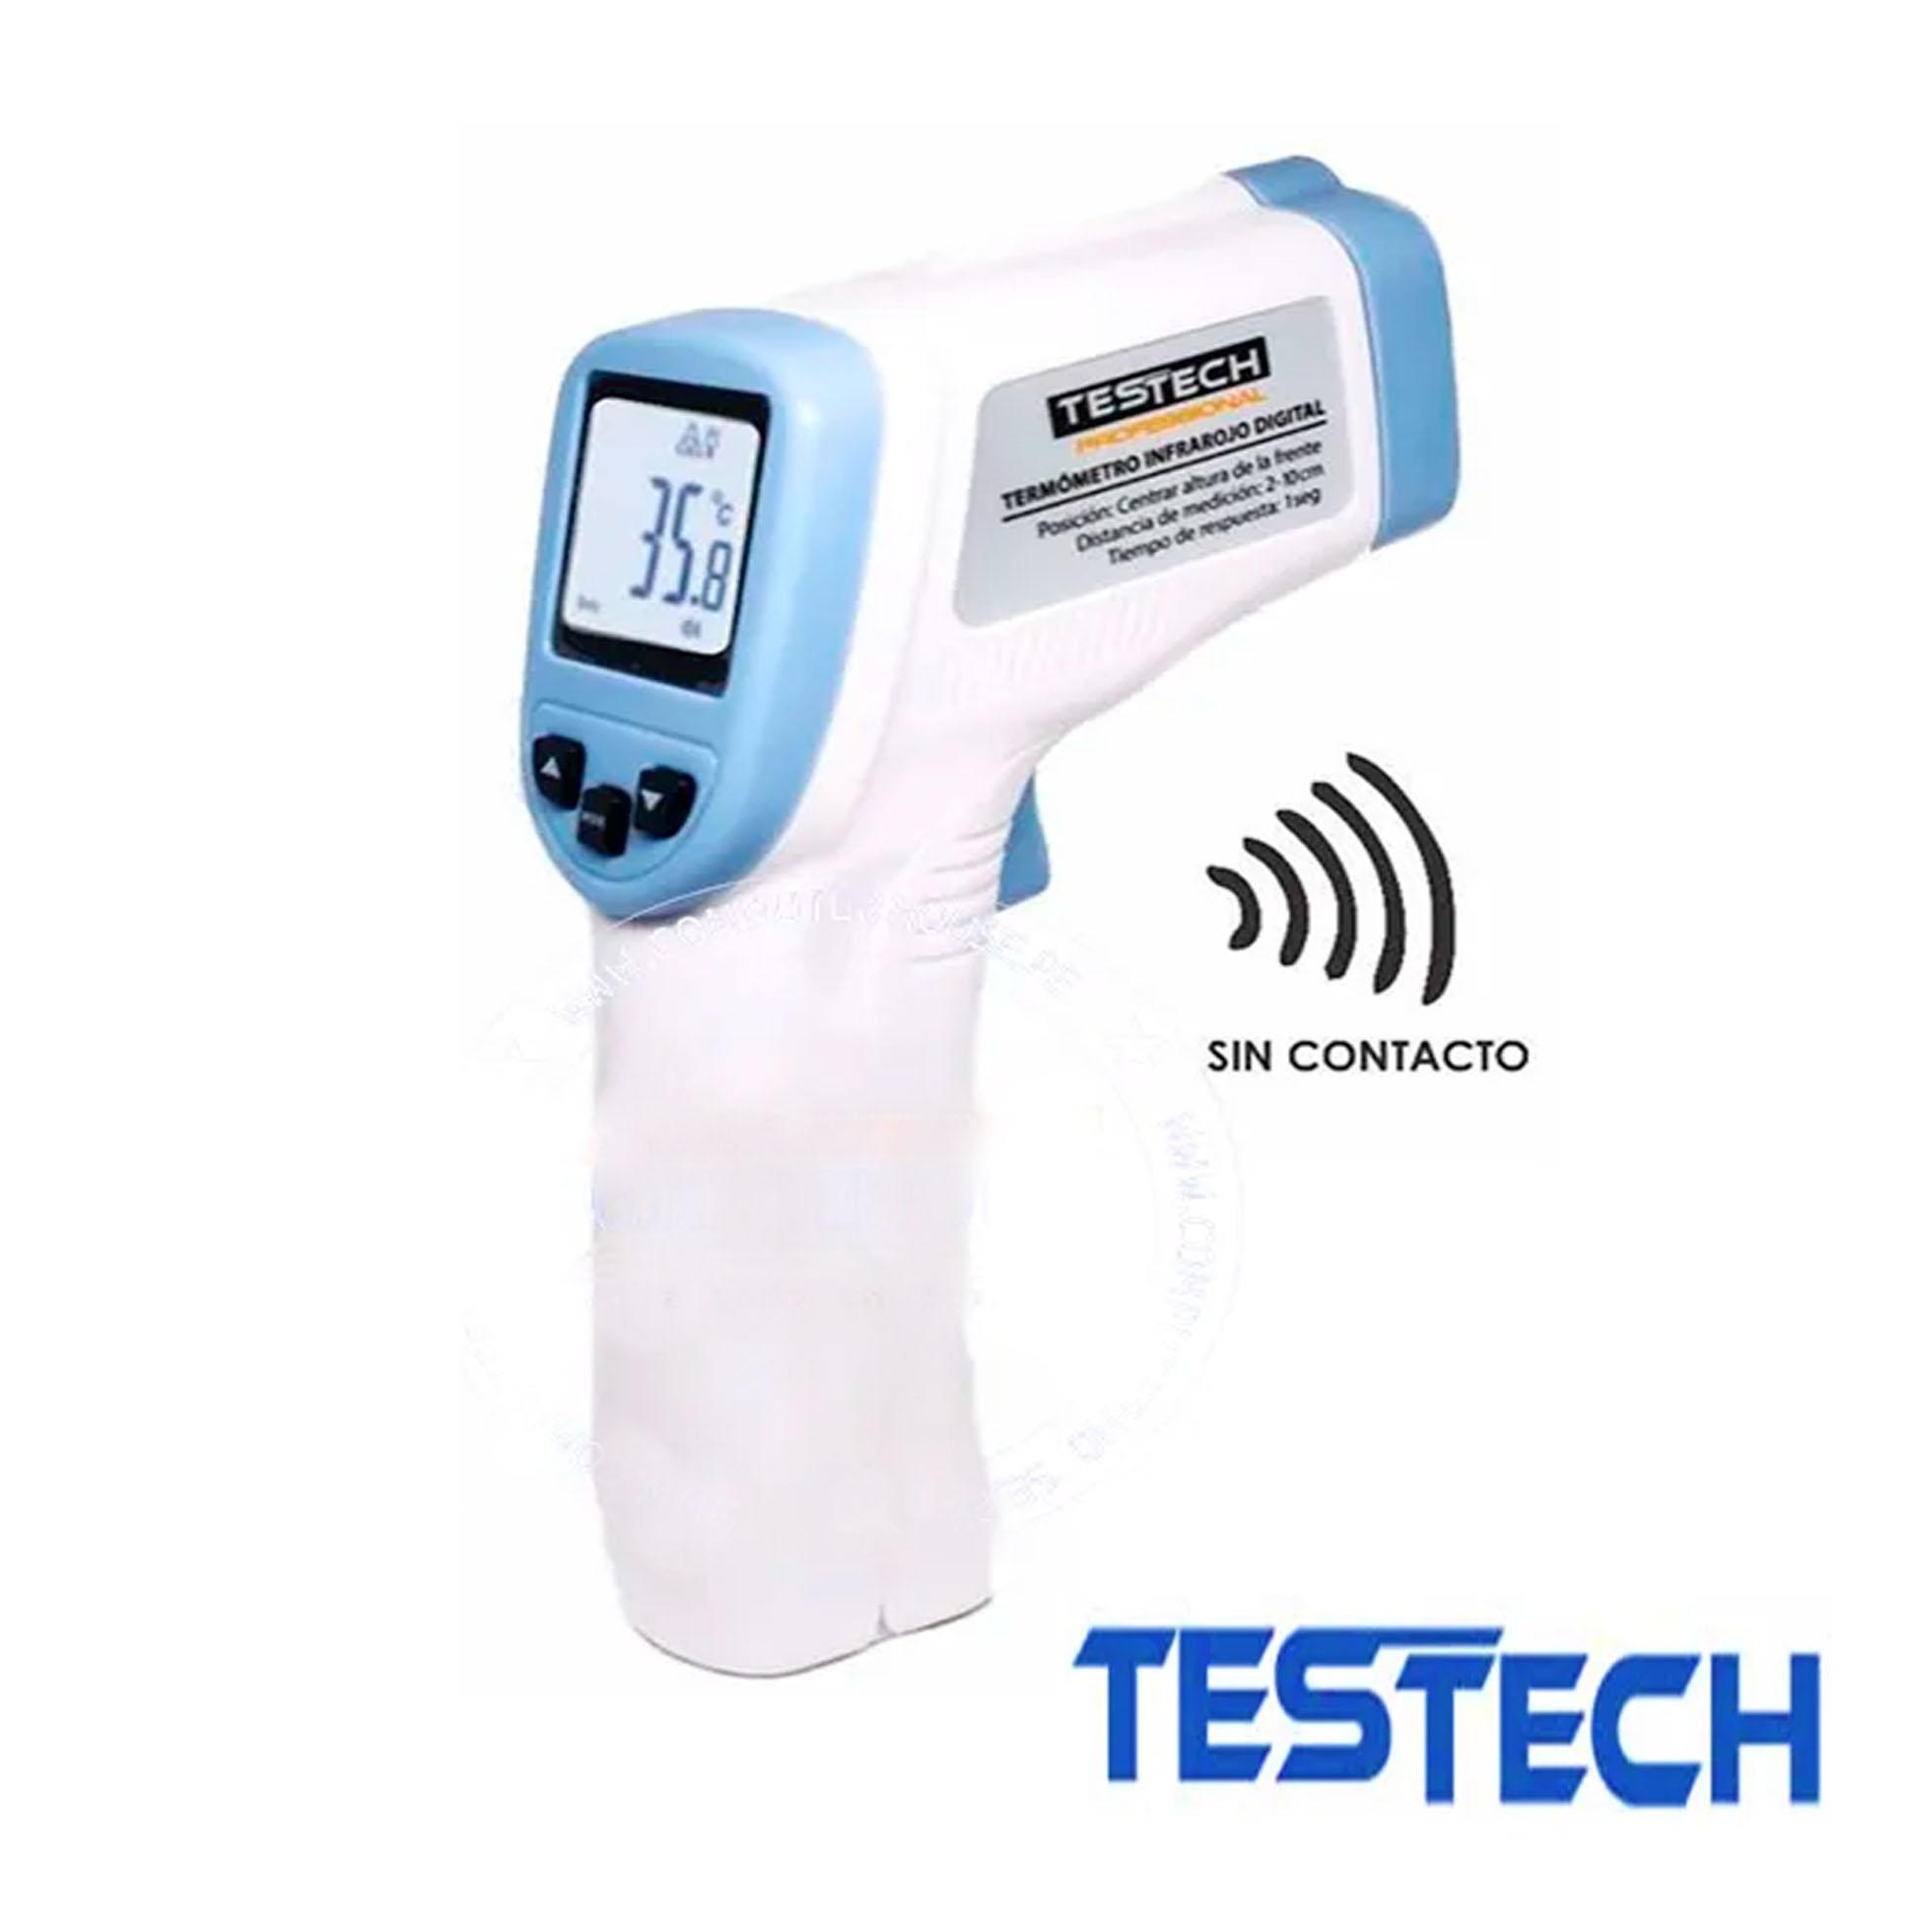 Termometro Infrarrojo Temperatura Digital